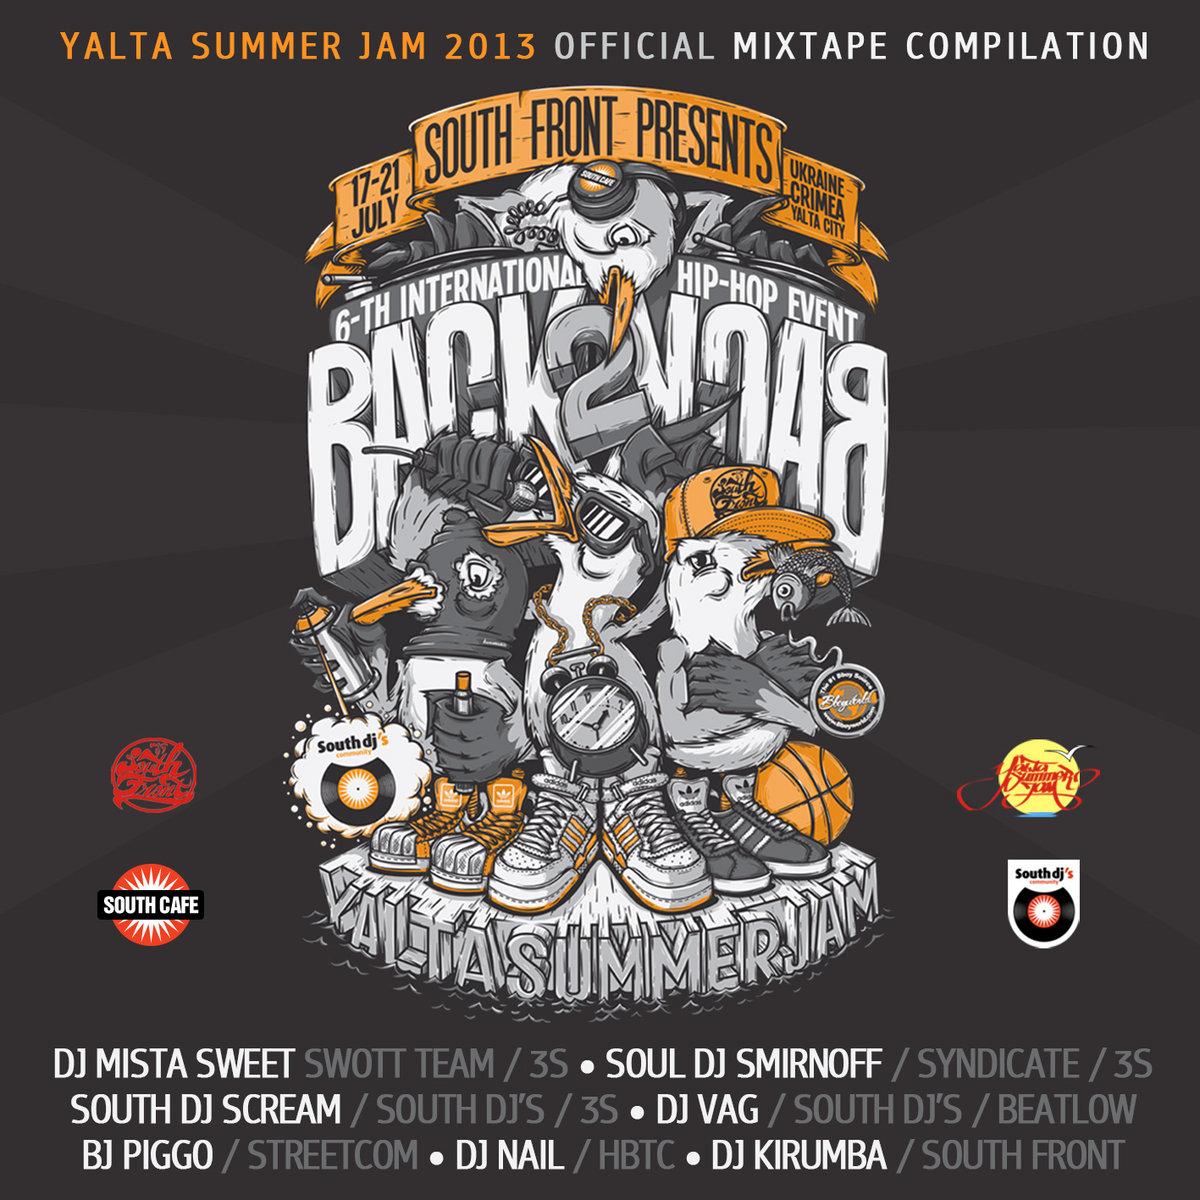 Yalta Summer Jam 2013 (official mixtape) | Vagskee (Dj Vag)